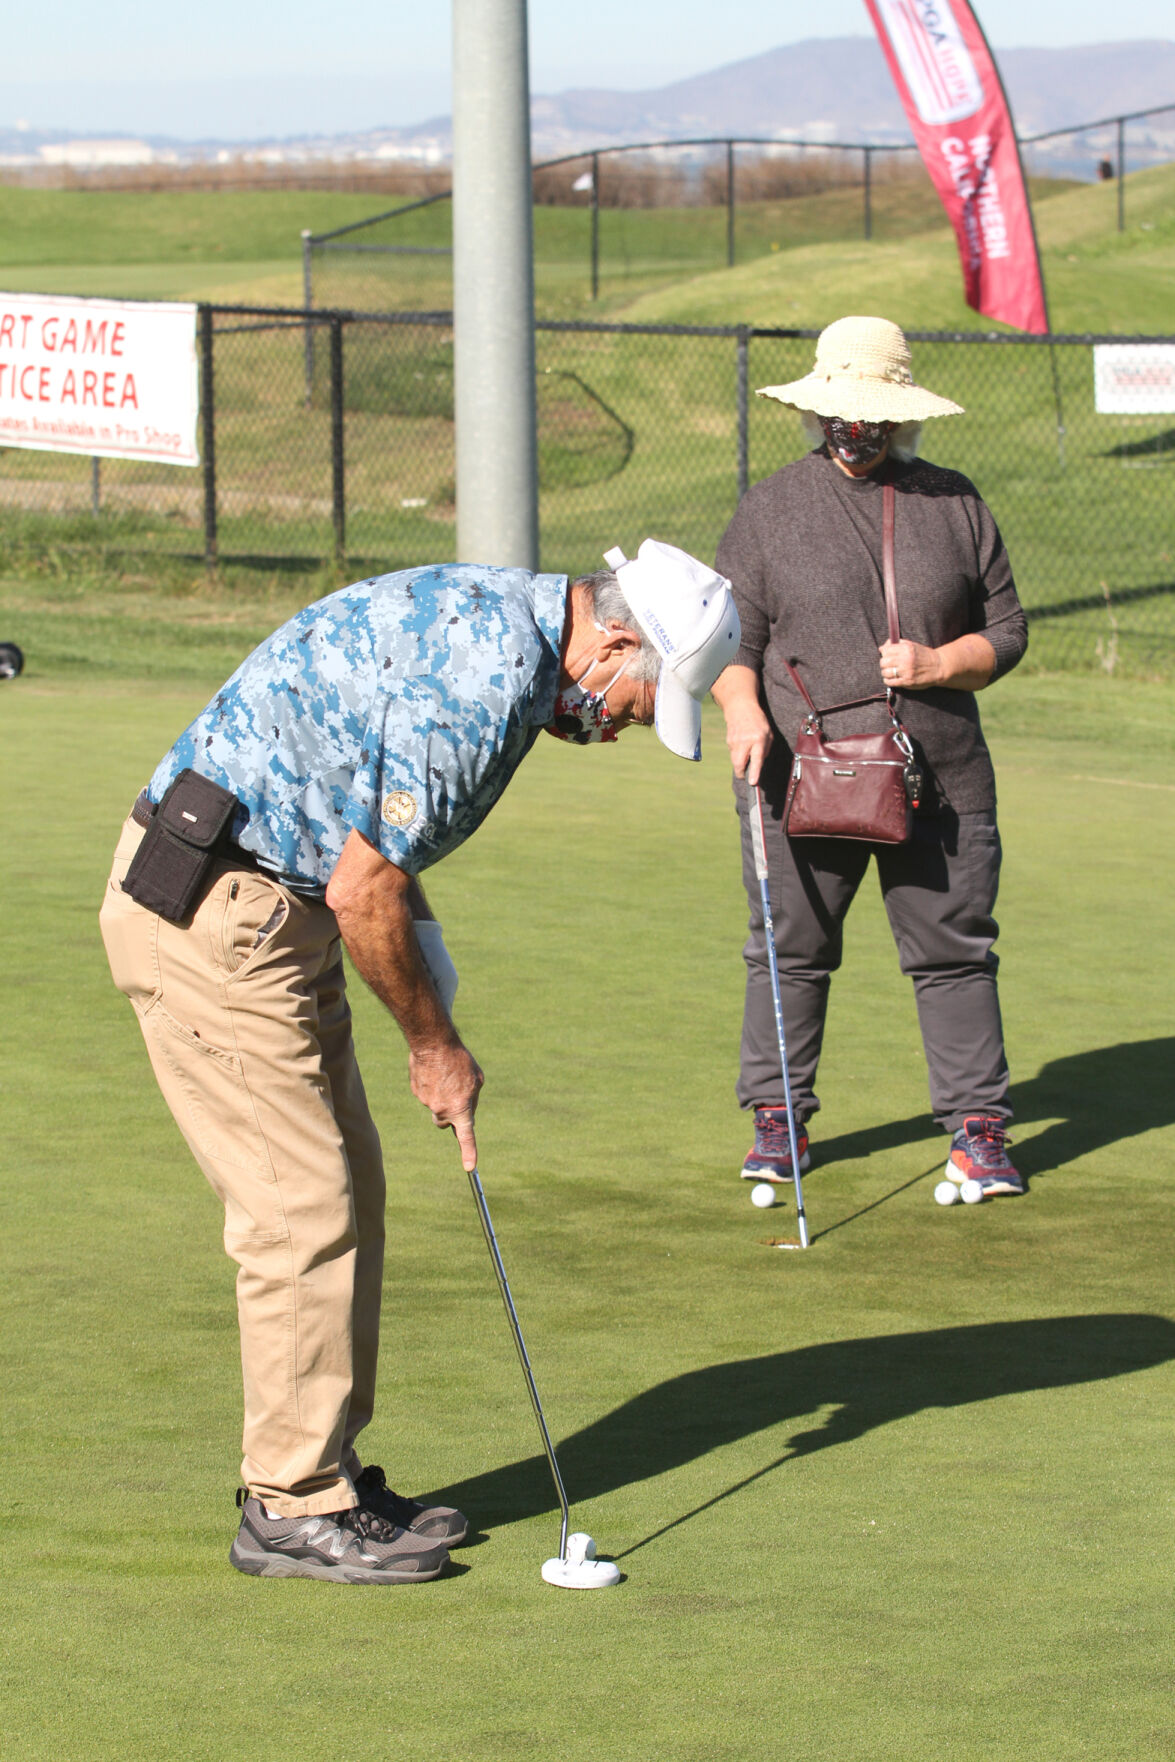 Veterans golf-putting